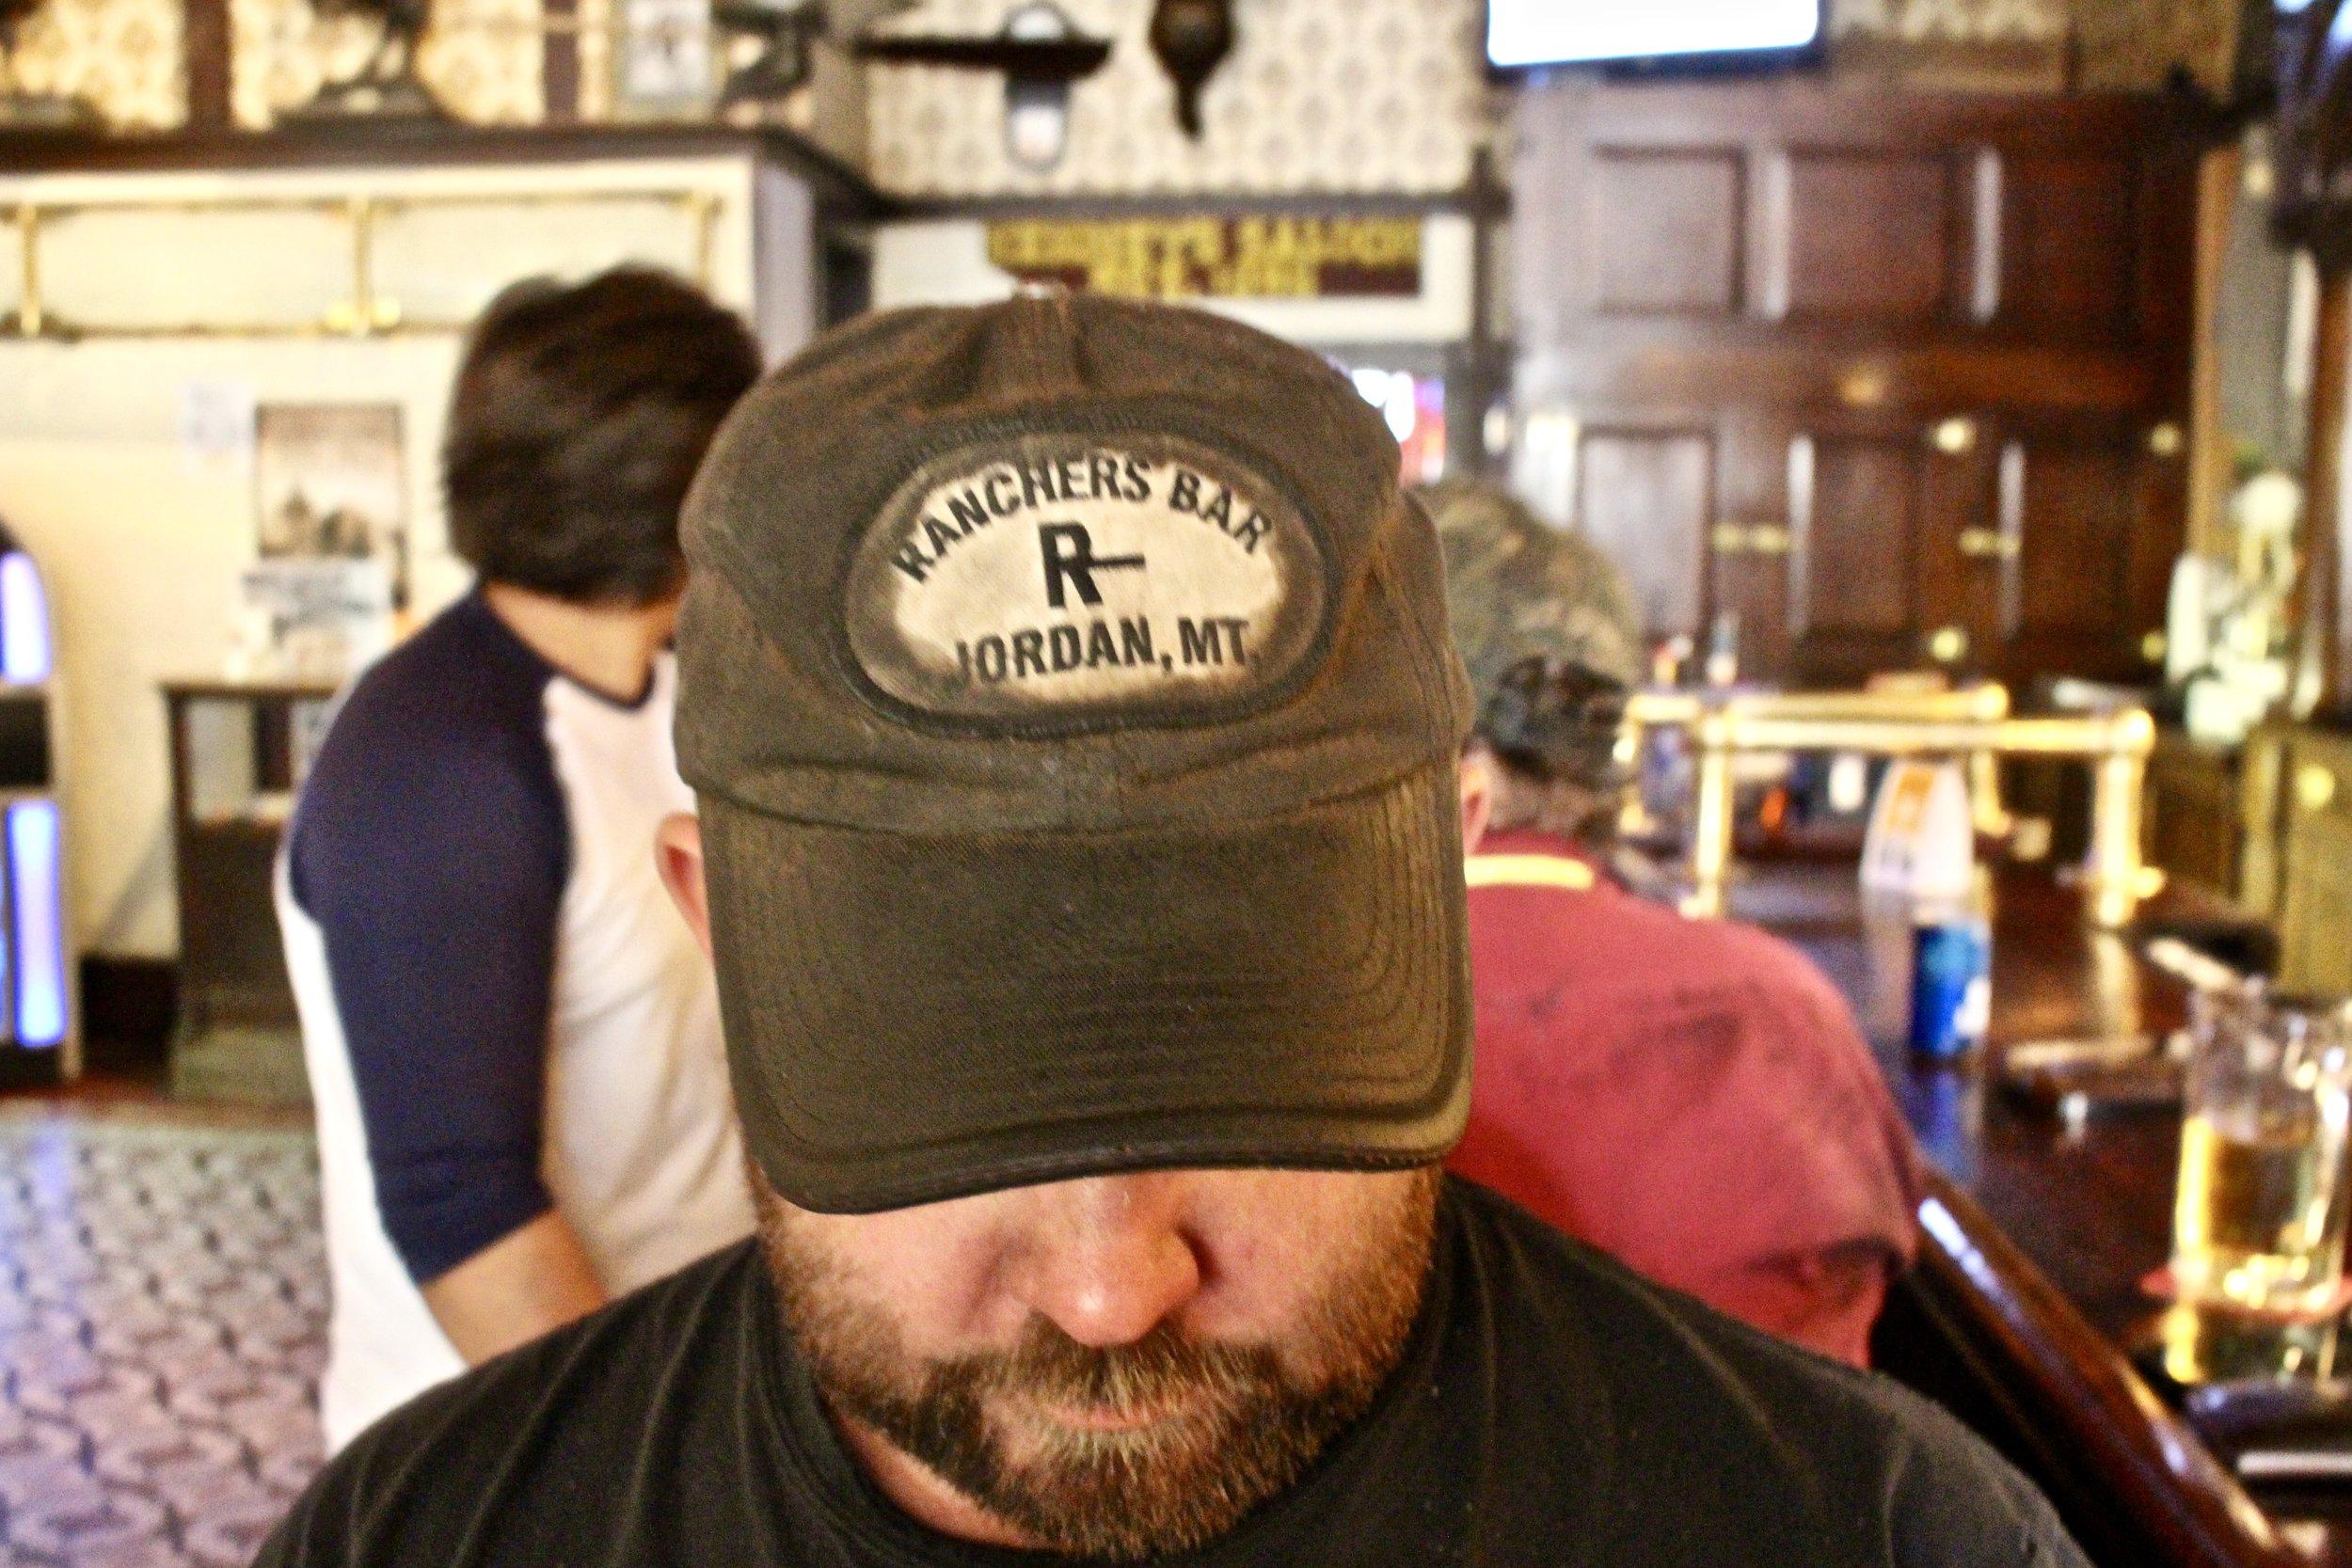 Scott's hat proudly boasts his hometown